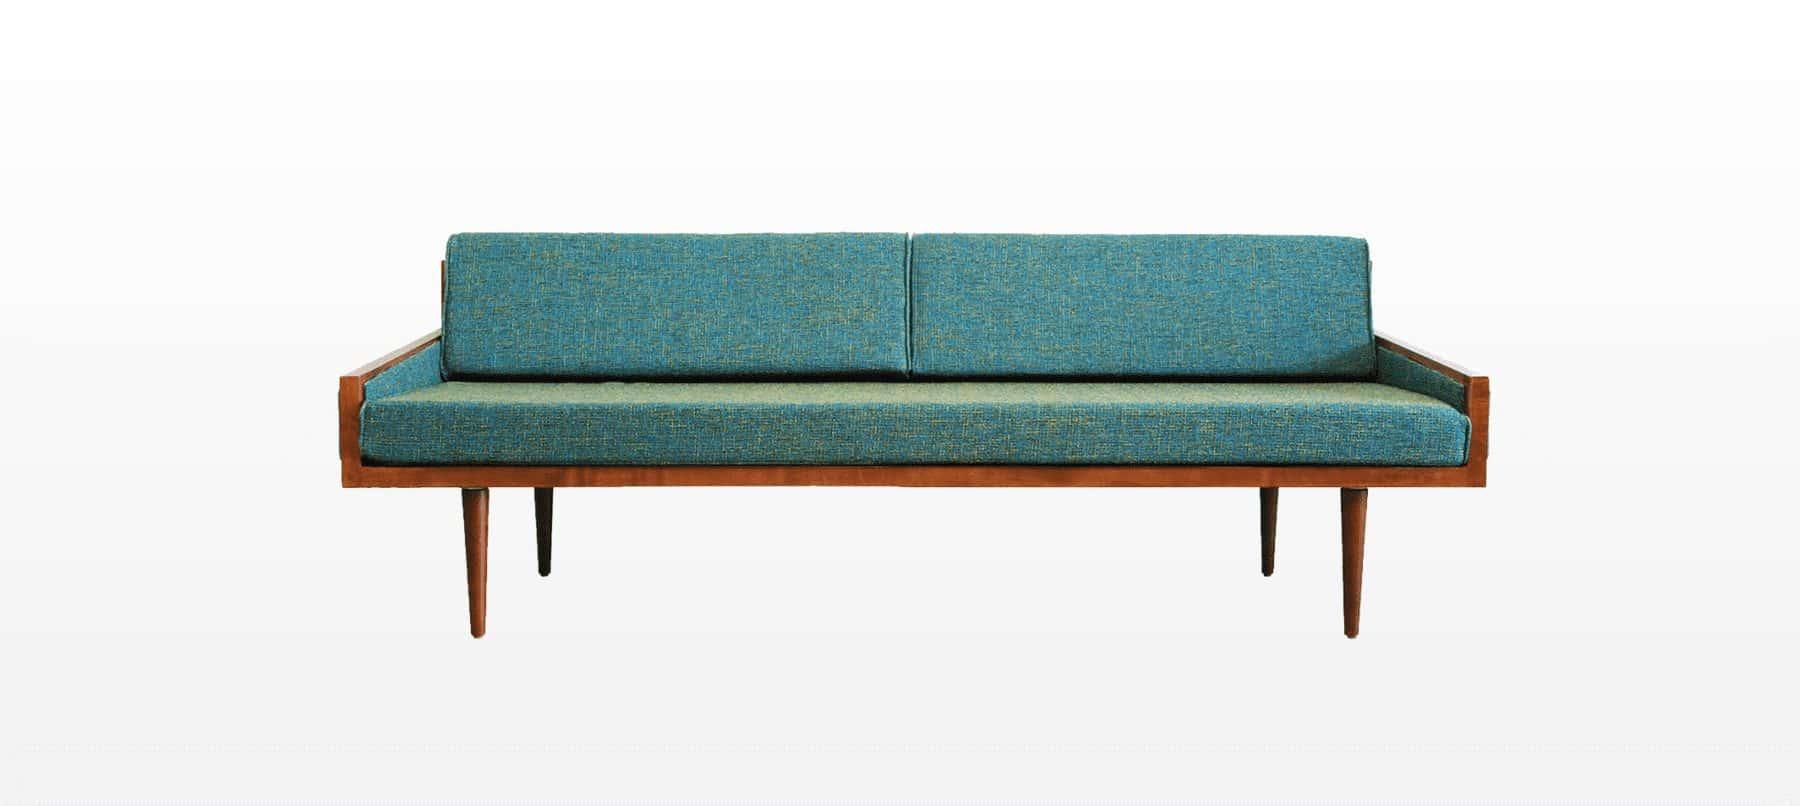 Swell California Mid Century Modern Execuitve Daybed Sofa Mcm Machost Co Dining Chair Design Ideas Machostcouk